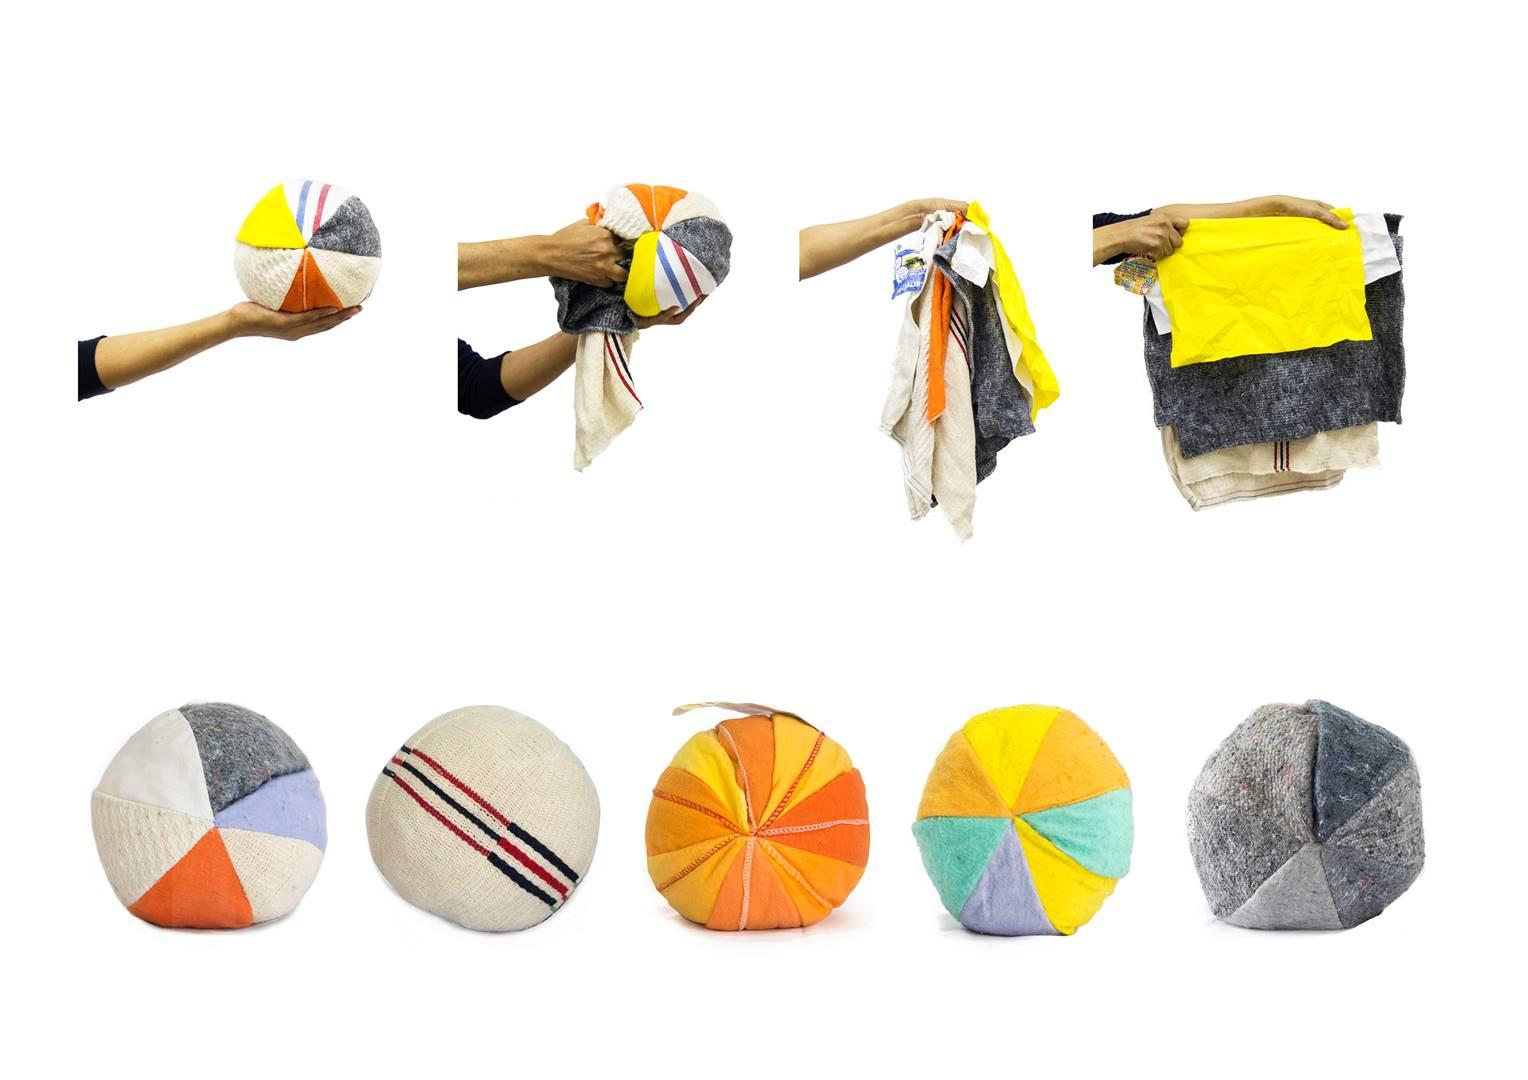 TRAPOLOGIA - PELOTA DE TRAPO - Coleccion de 5 pelotas y proceso de transformacion de Hecho Pelota a Hecho Trapo - PH FLAVIA CANELO (Copy)